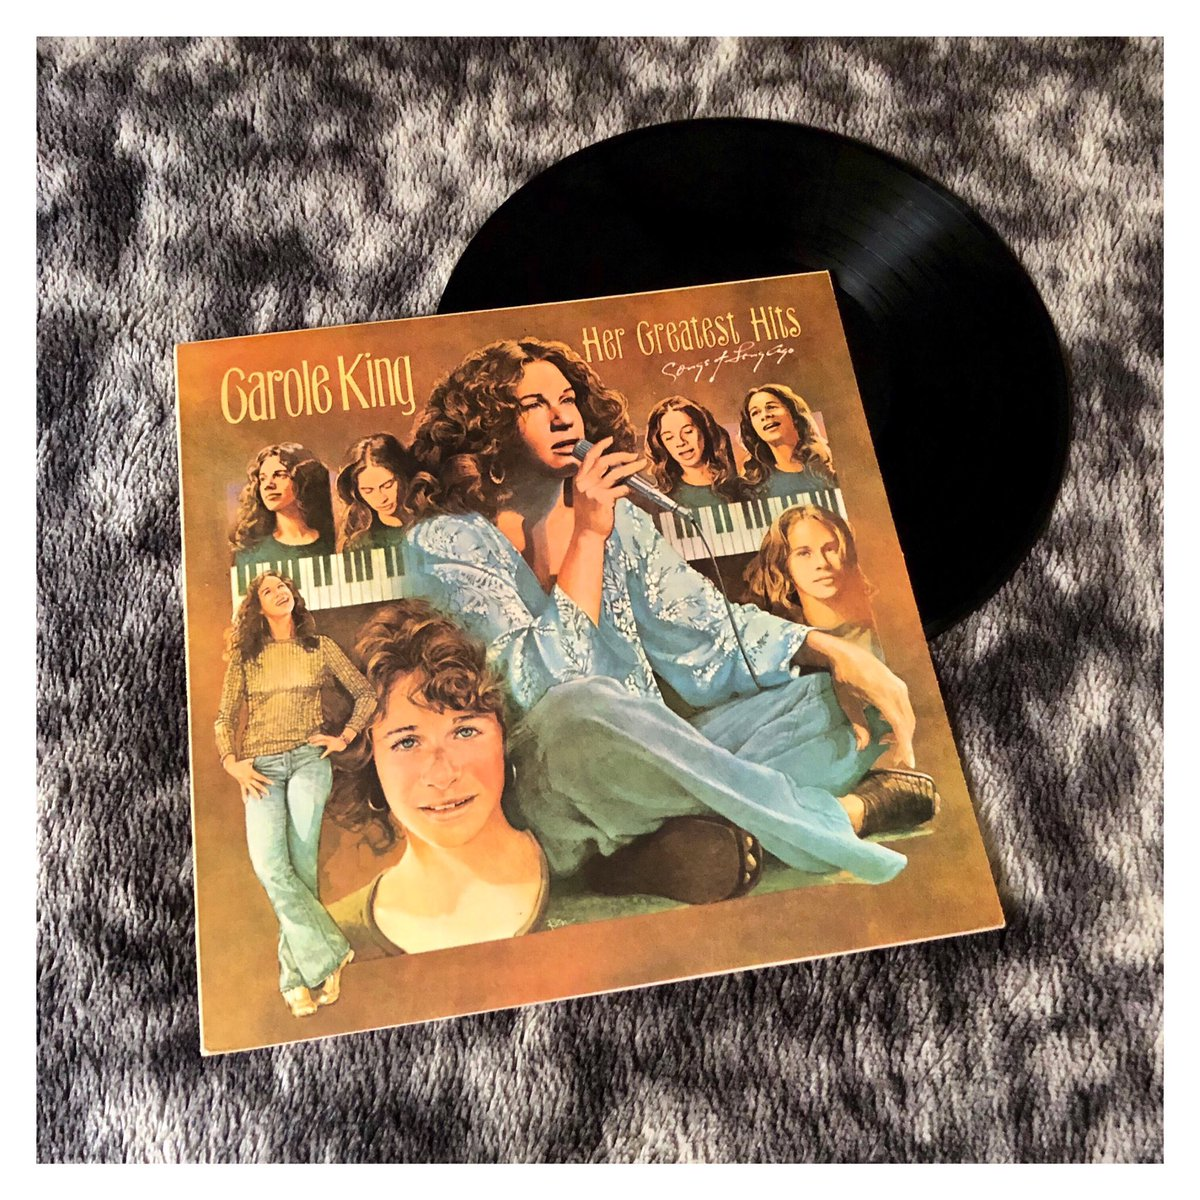 Carole King - Her Greatest Hits: Songs Of Long Ago - 1978  #caroleking #songsoflongago #songsoflongagovinyl #hergreatesthits #hergreatesthitsvinyl #vinyl #vinylcollection #myvinylcollection #vinylcollectors #ilovevinyl #music #ilovemusic #carolekingvinyl #carolekingmusicpic.twitter.com/WFIxek47D1